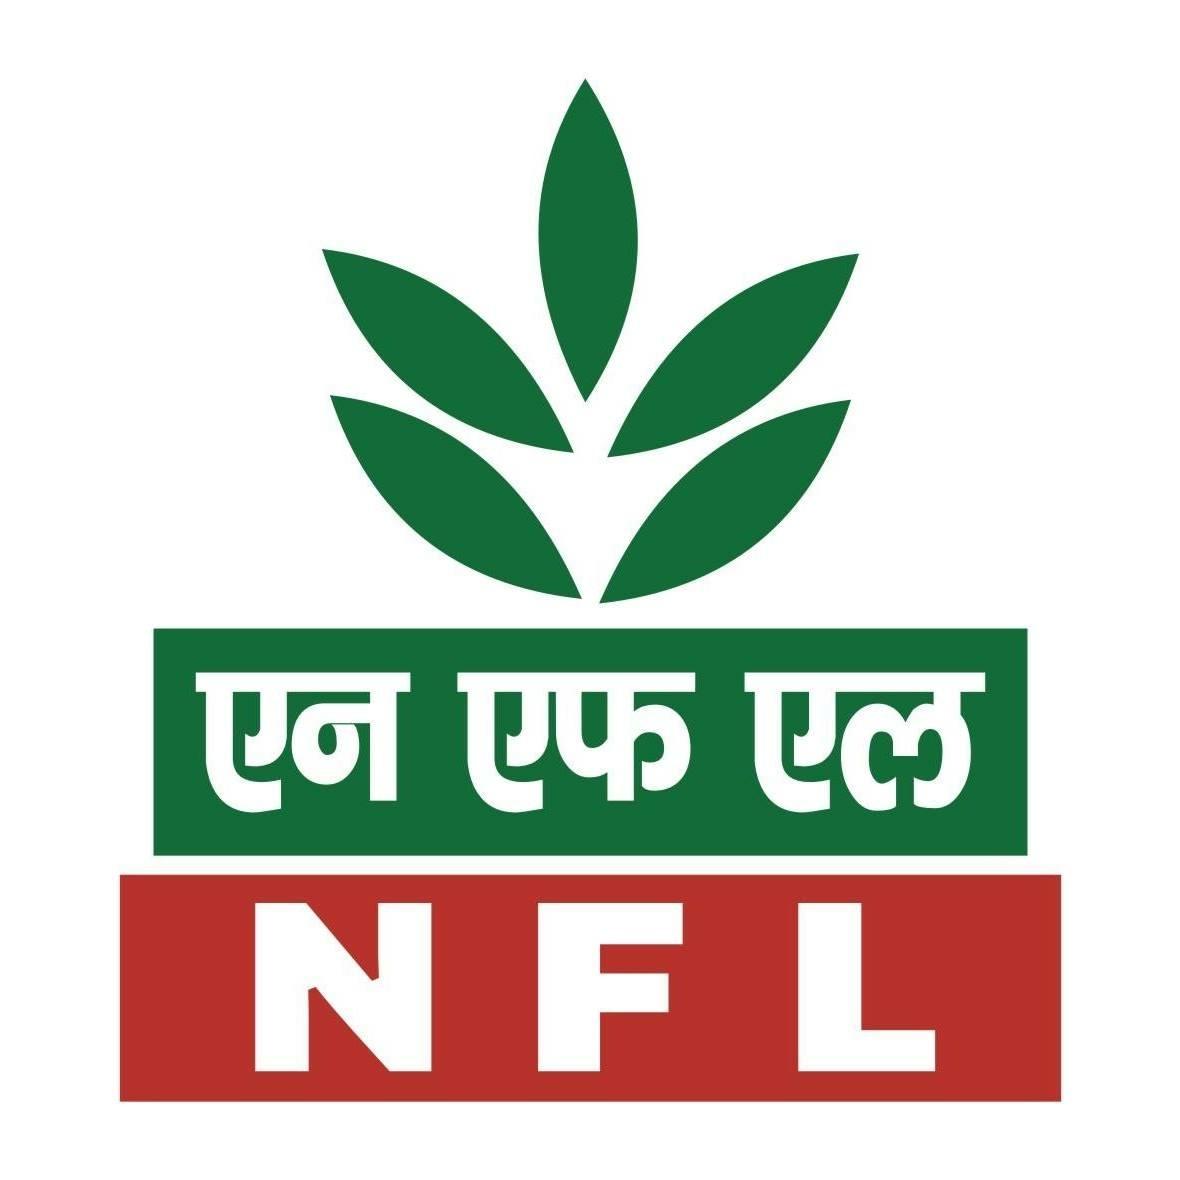 NFL, Panipat, Nayanangal, Bhatinda